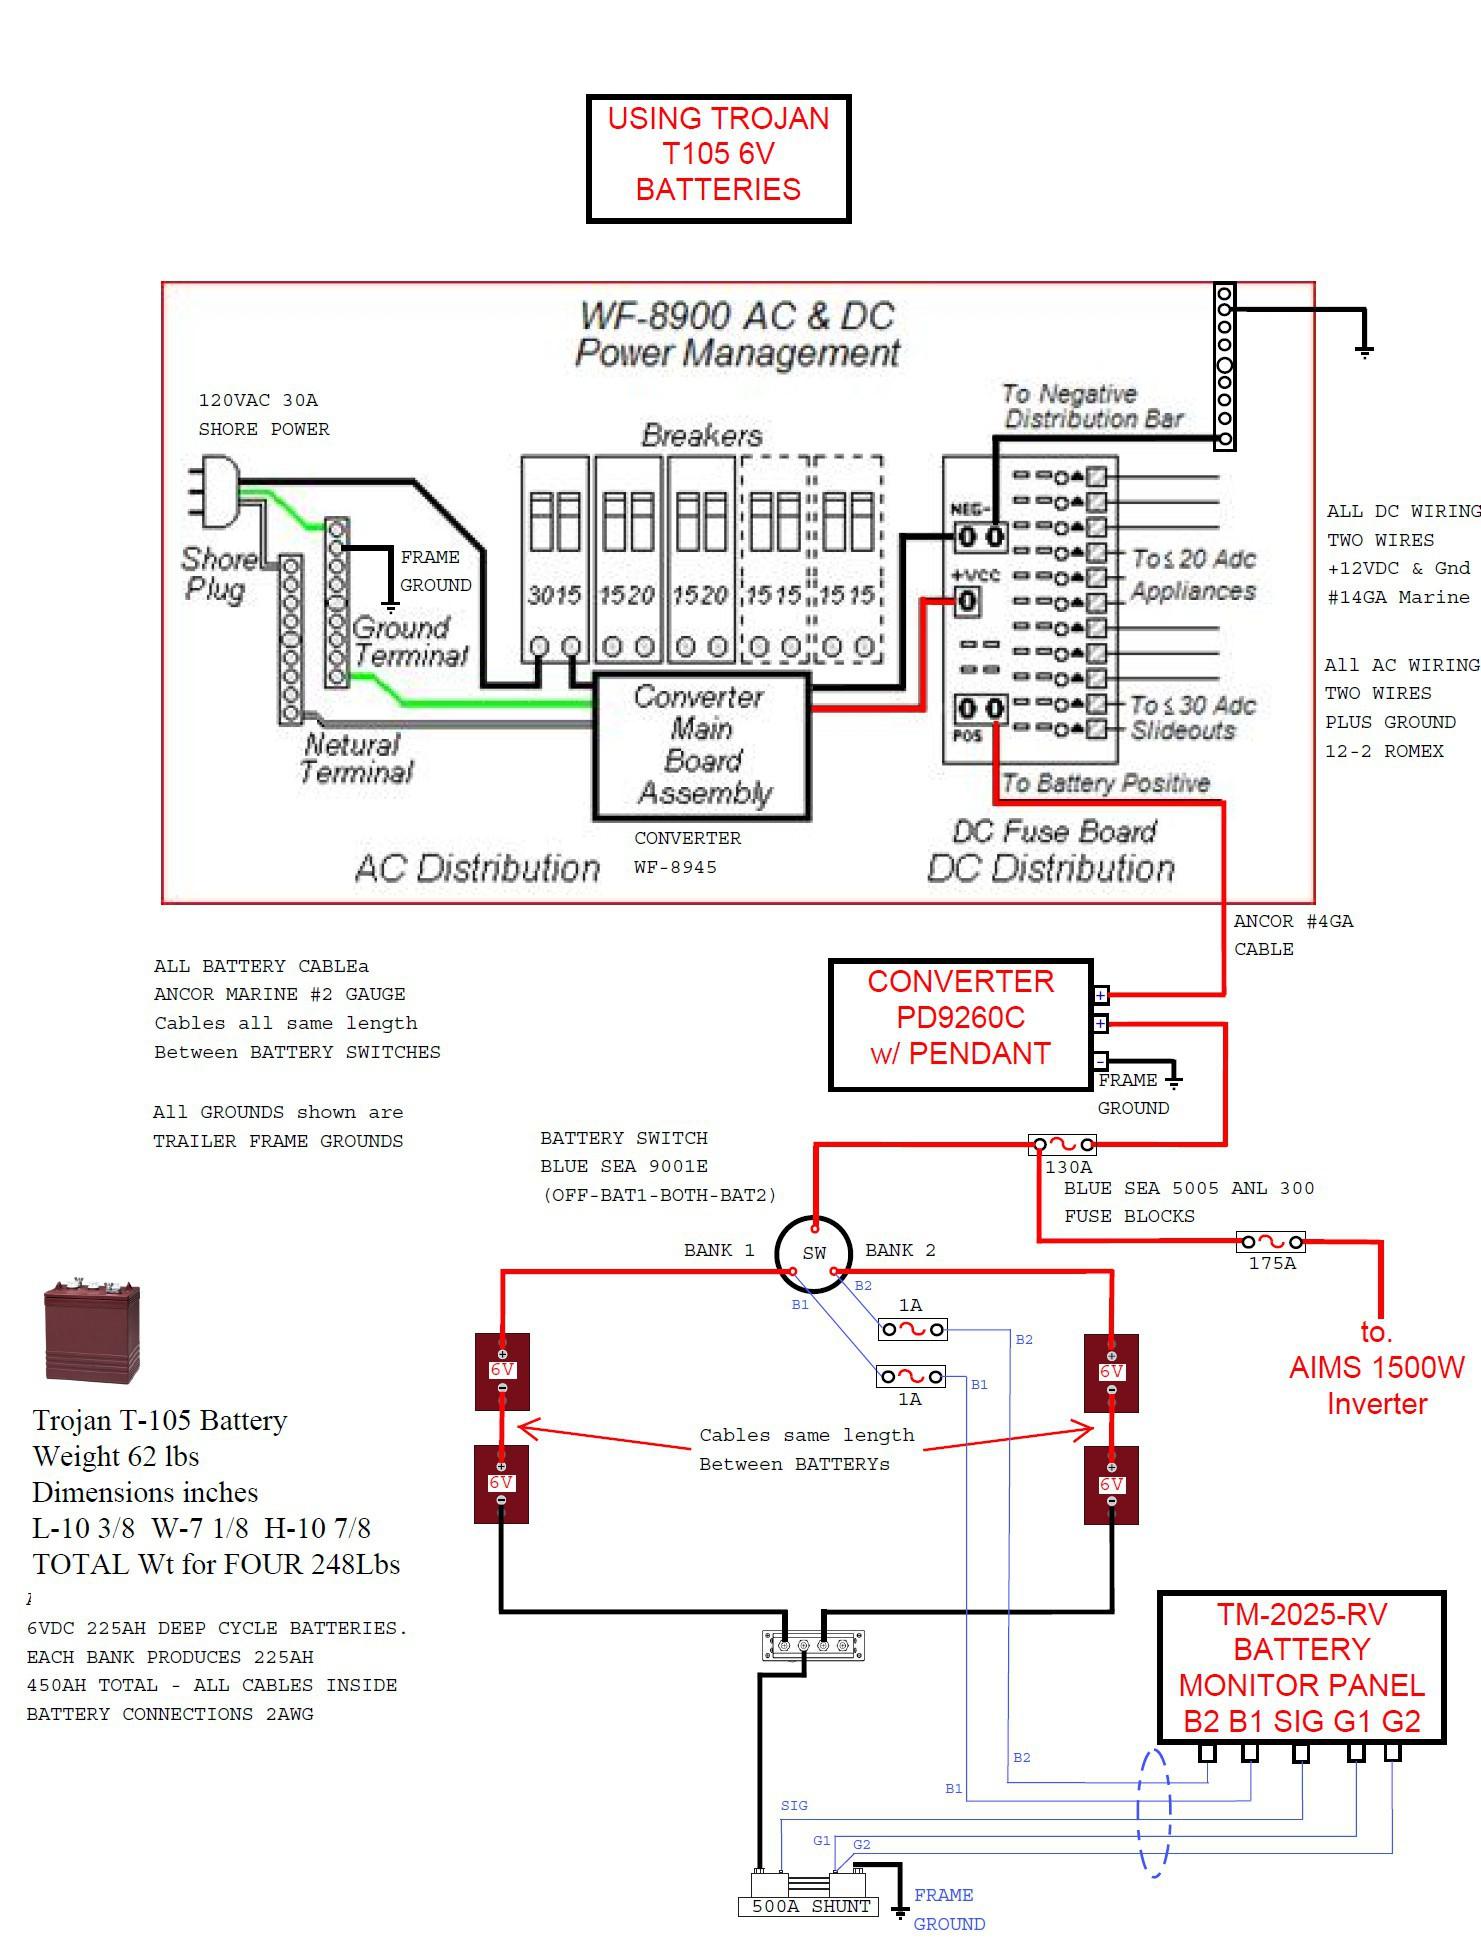 Rv Holding Tank Monitor Panel Wiring Diagram | Wiring Diagram - Rv Holding Tank Sensor Wiring Diagram